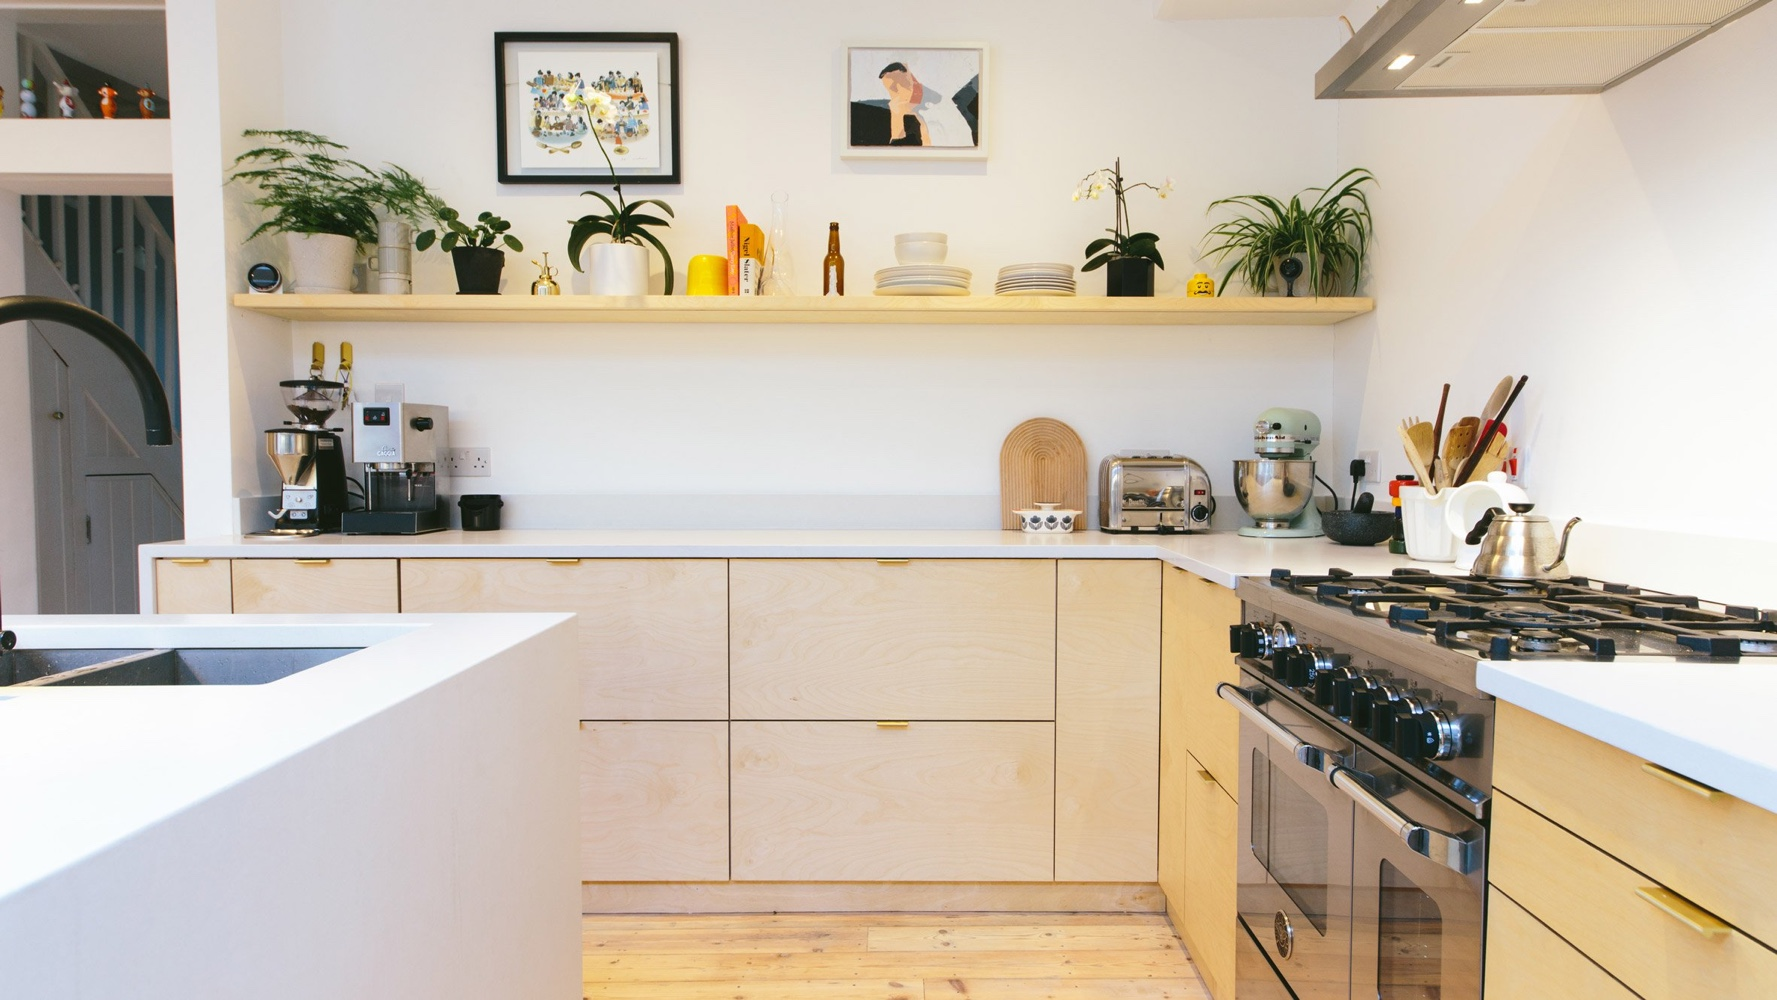 IKEA Kitchens Hacked by 4 Enterprising Establishments